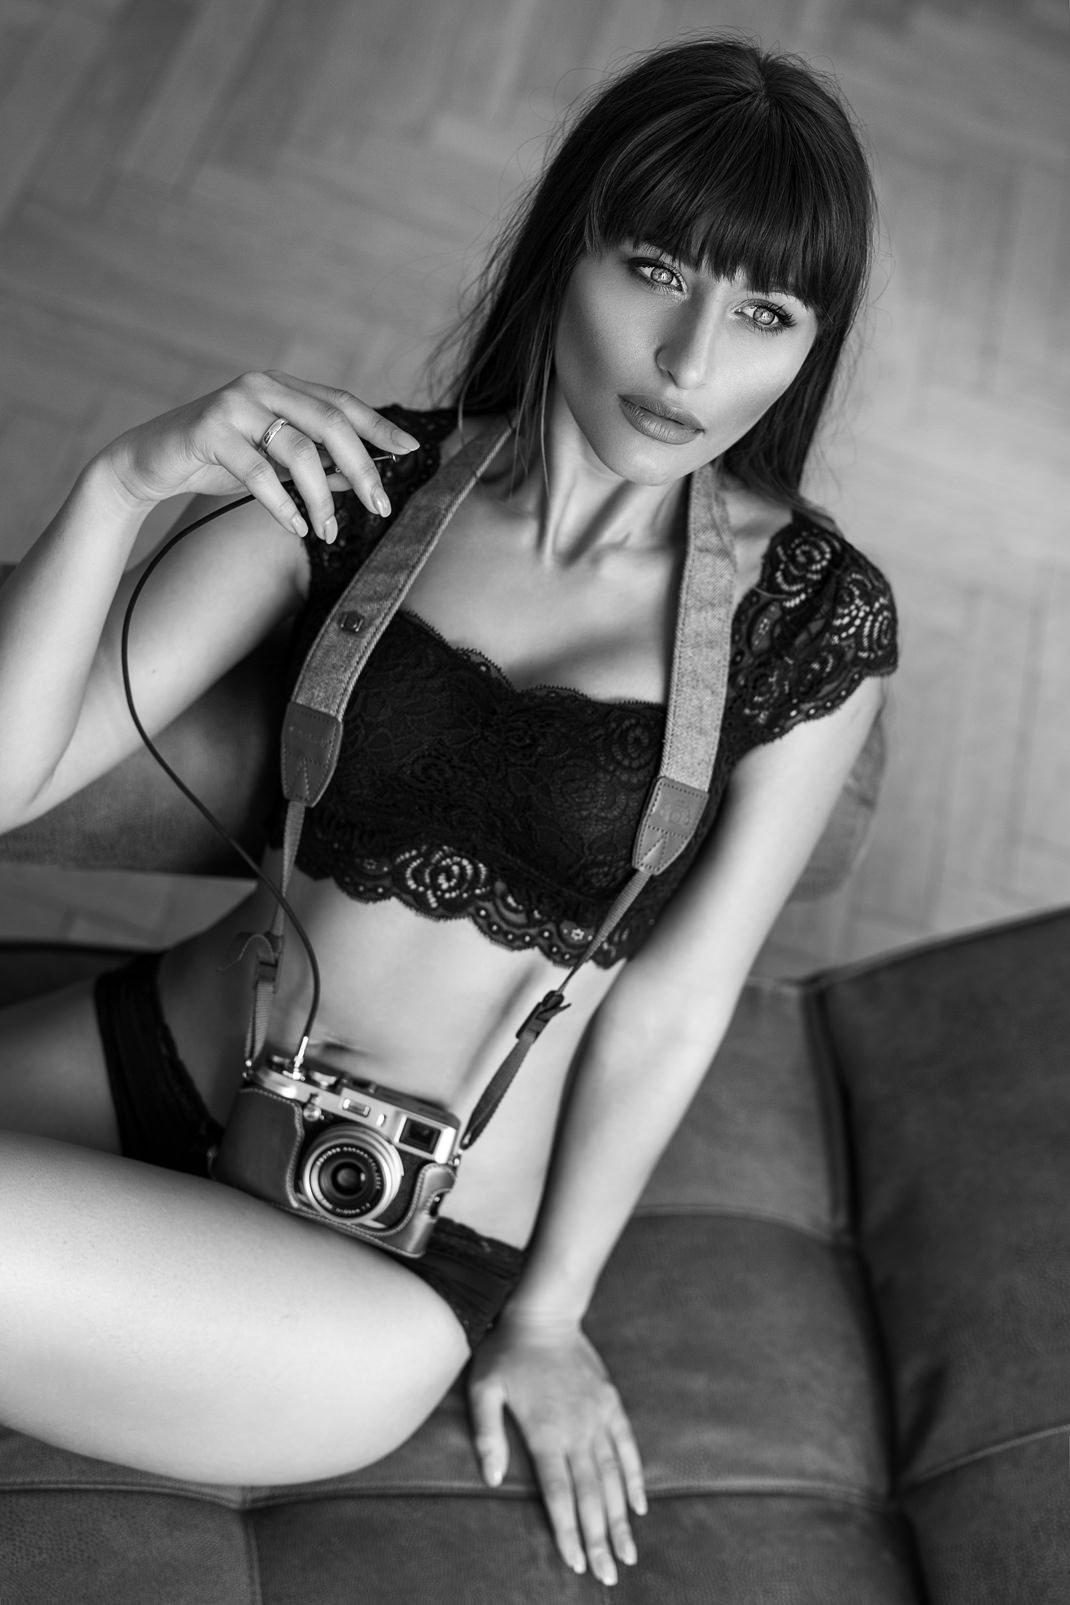 Two Beauties - Kristina & Fuji X100S - Markus Hertzsch - Camera - Girl